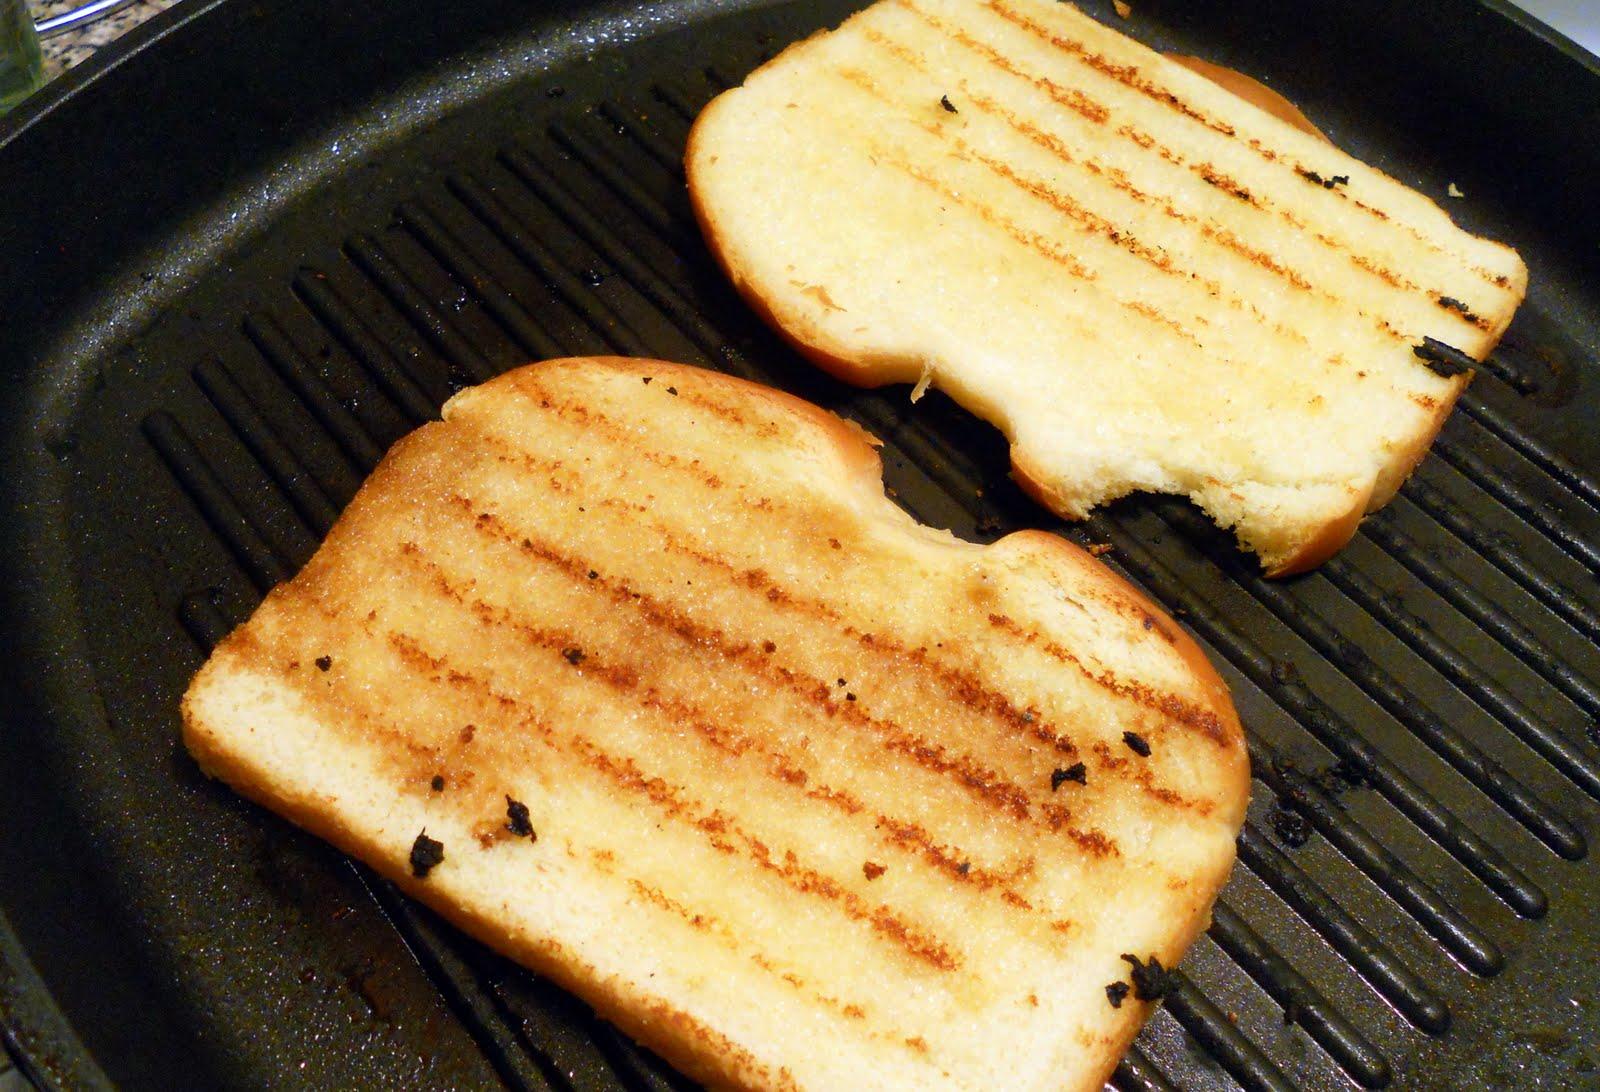 Silver Pencils: Flank Steak on Texas Toast with Chimichurri